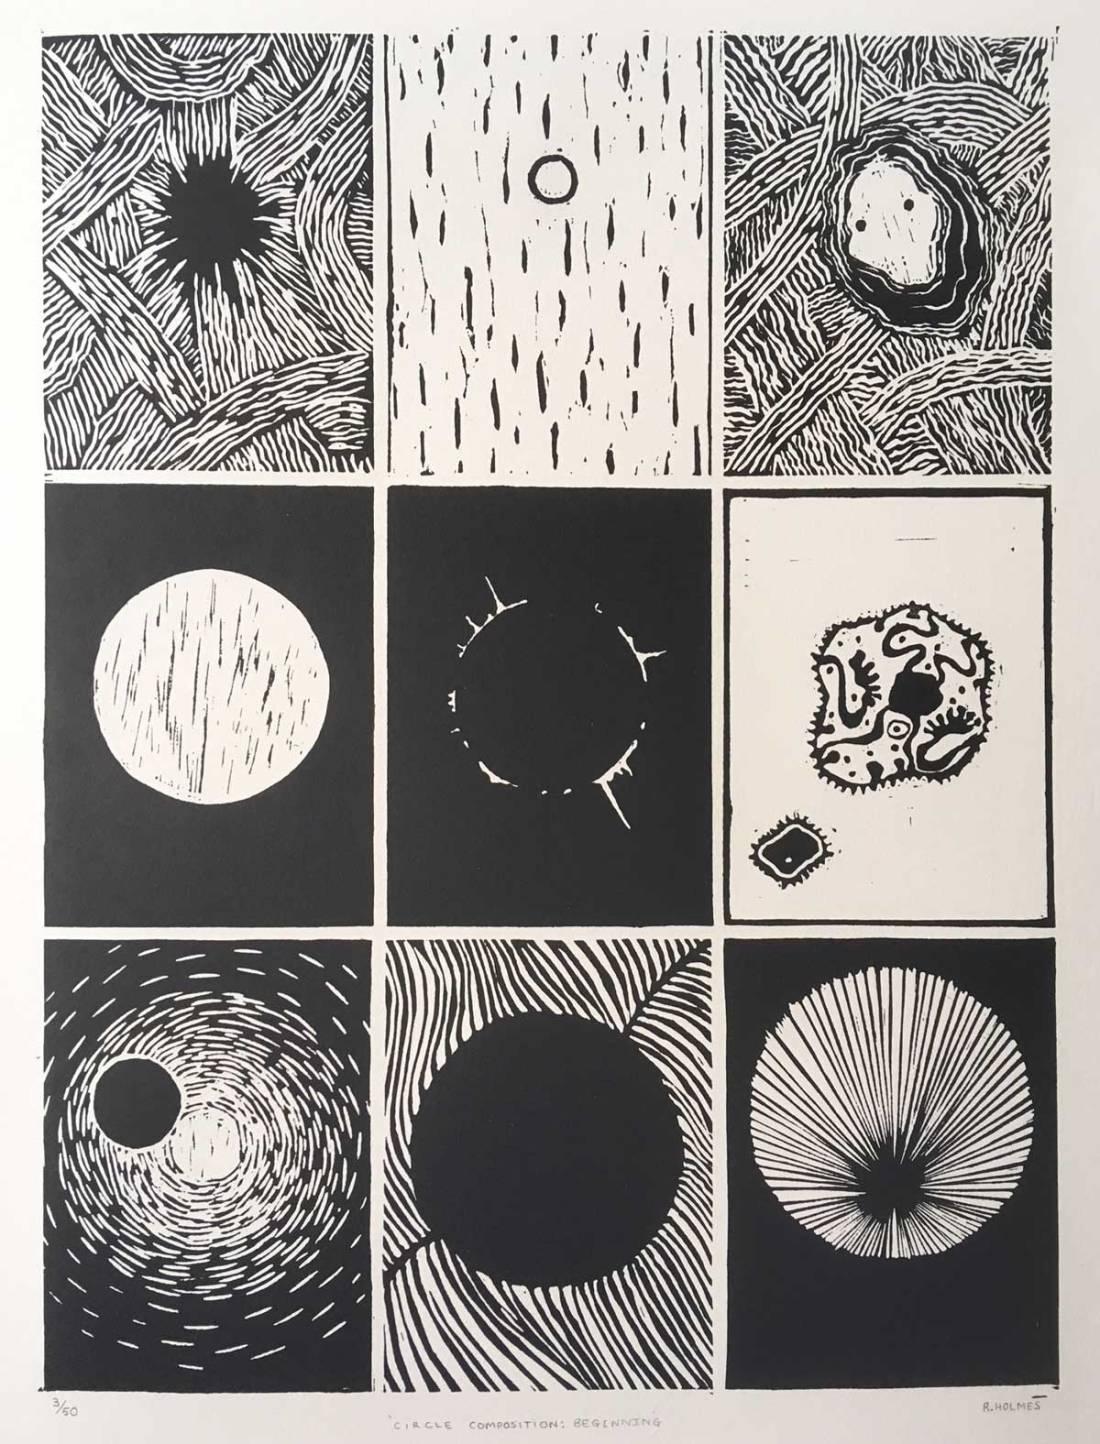 Circle Composition: Beginning